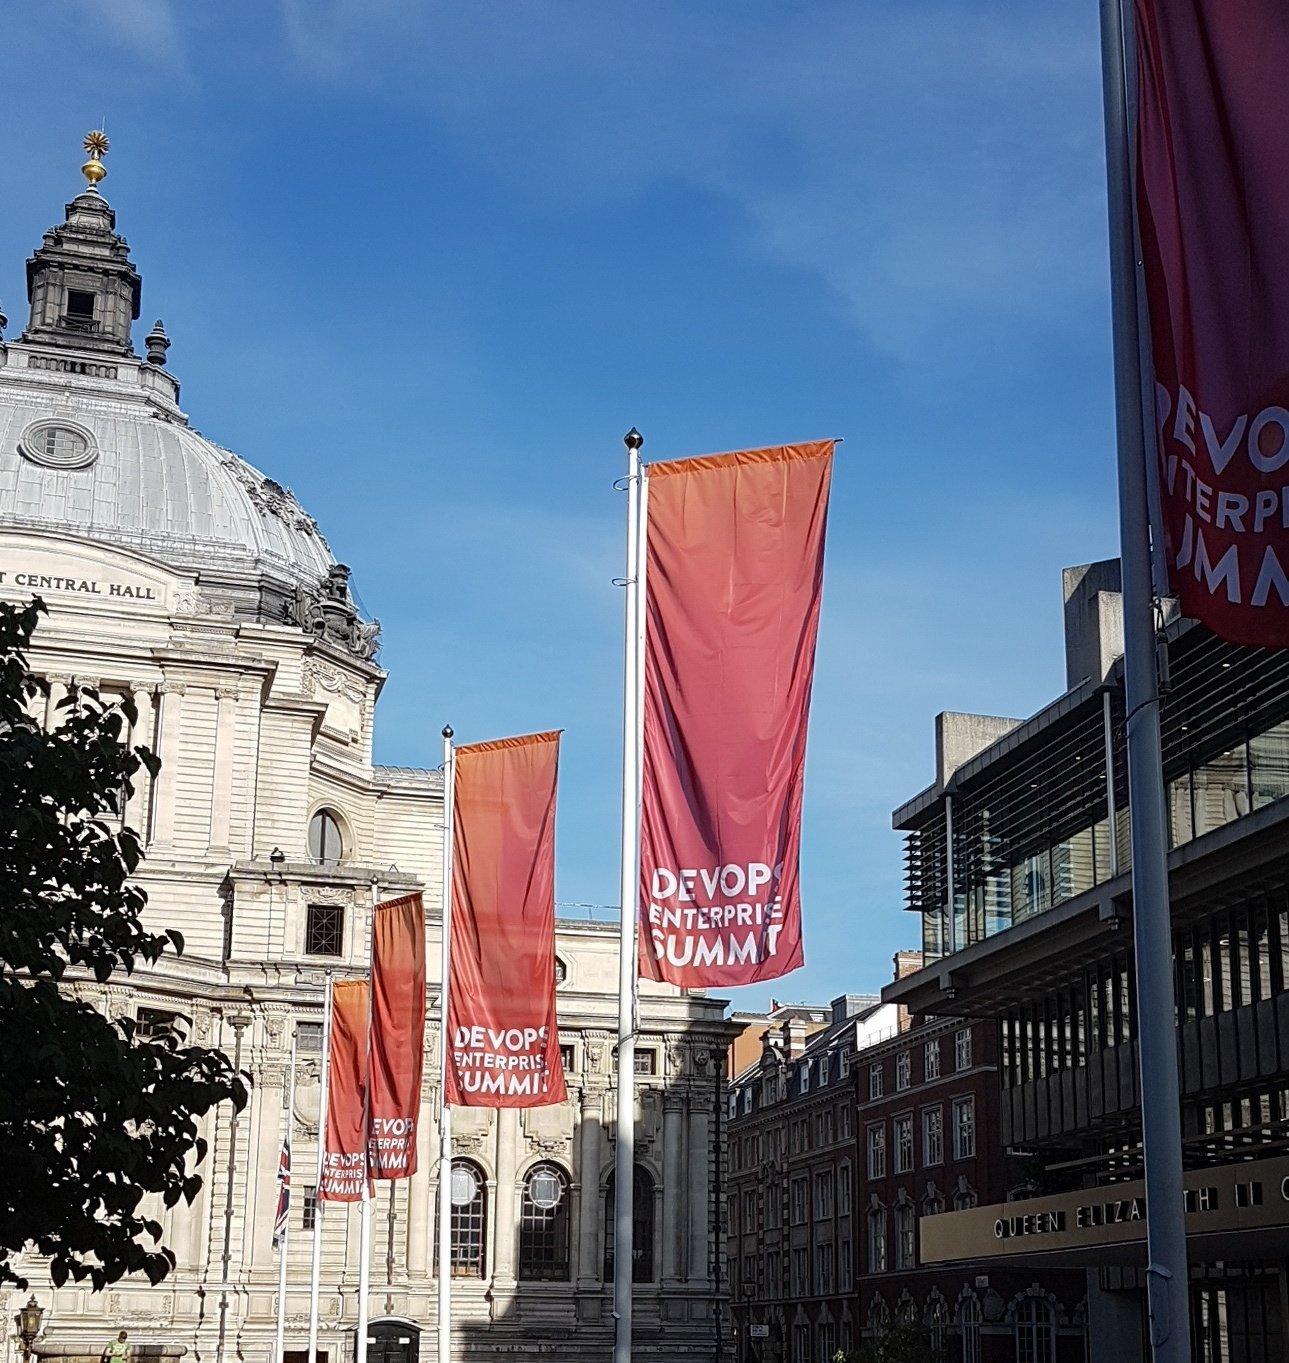 Lookong forward to Devops Enterprise Summit 2017 in London today #DOES17 https://t.co/wWNxs6uyYV